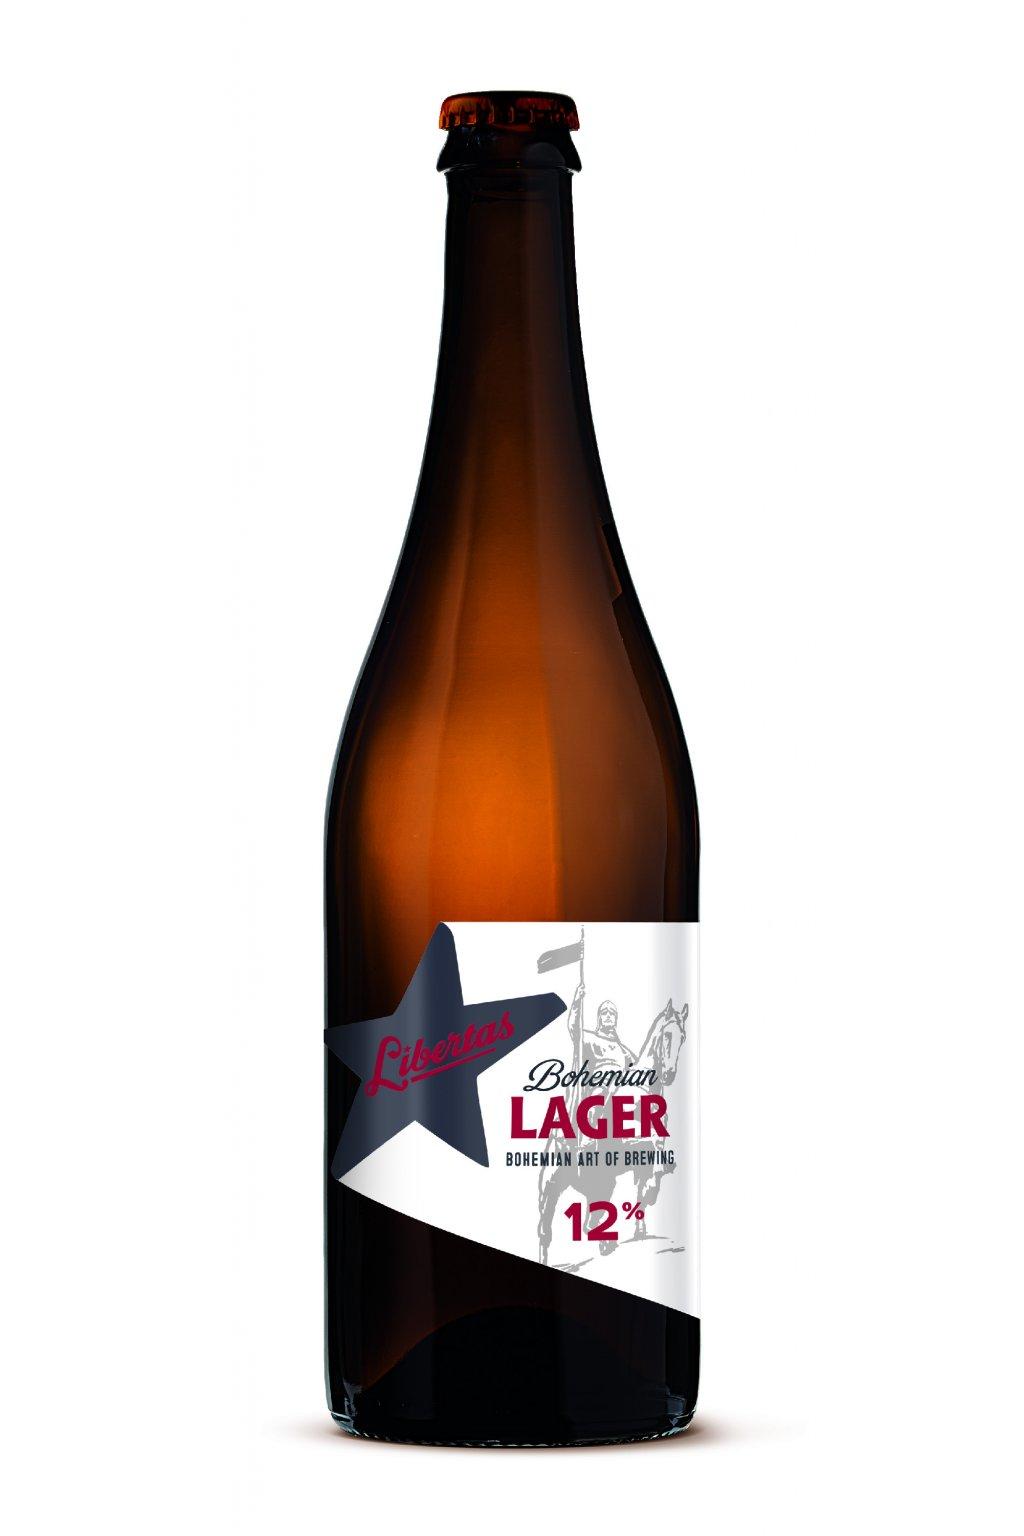 LBT003 12 v01 Libertas Bohemian lager 12 CMYK 300dpi